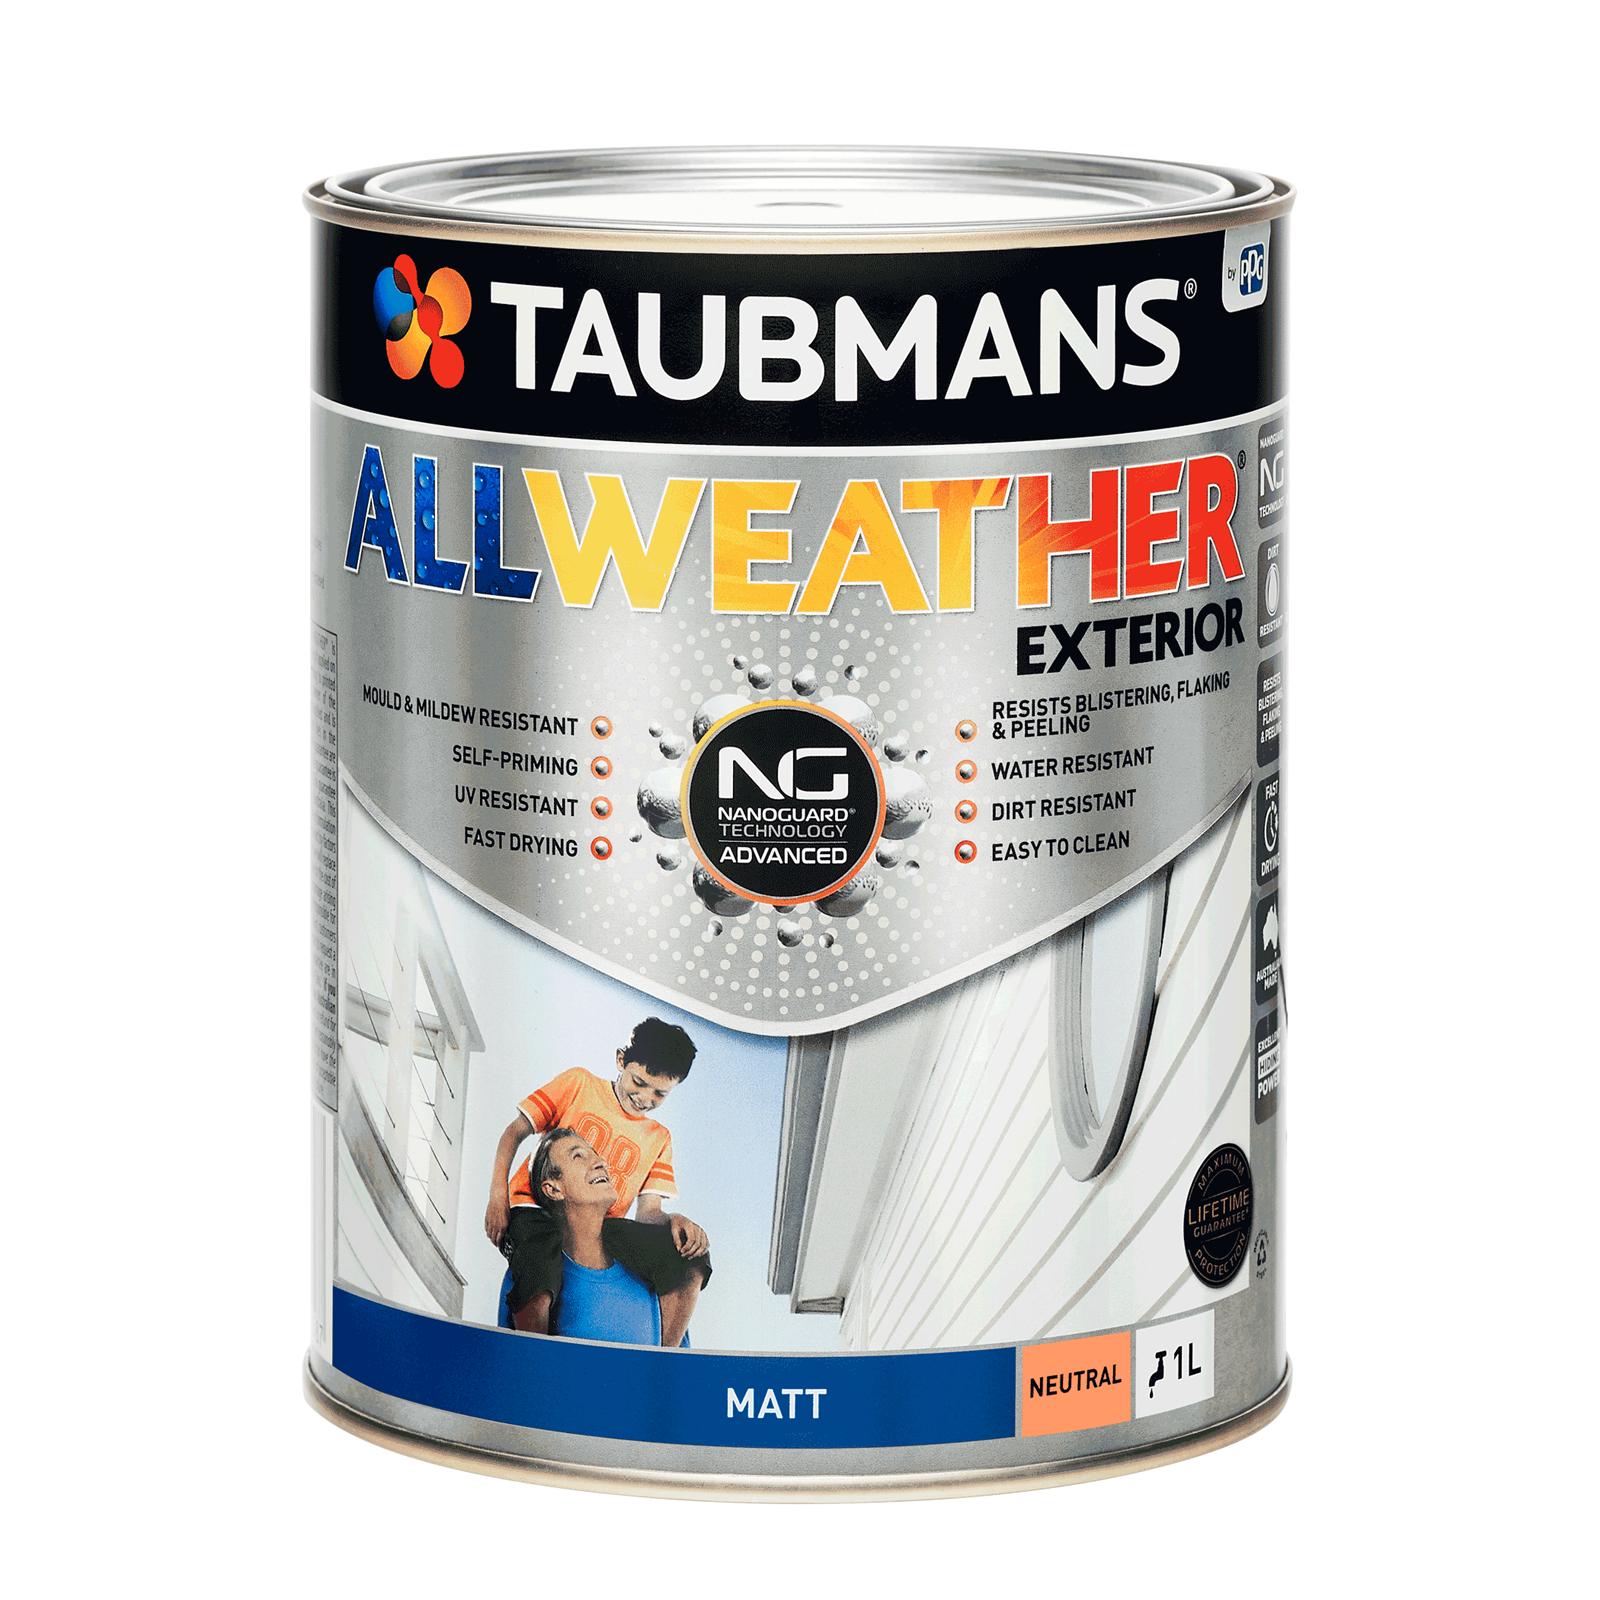 Taubmans 1L Neutral Matt All Weather Exterior Paint